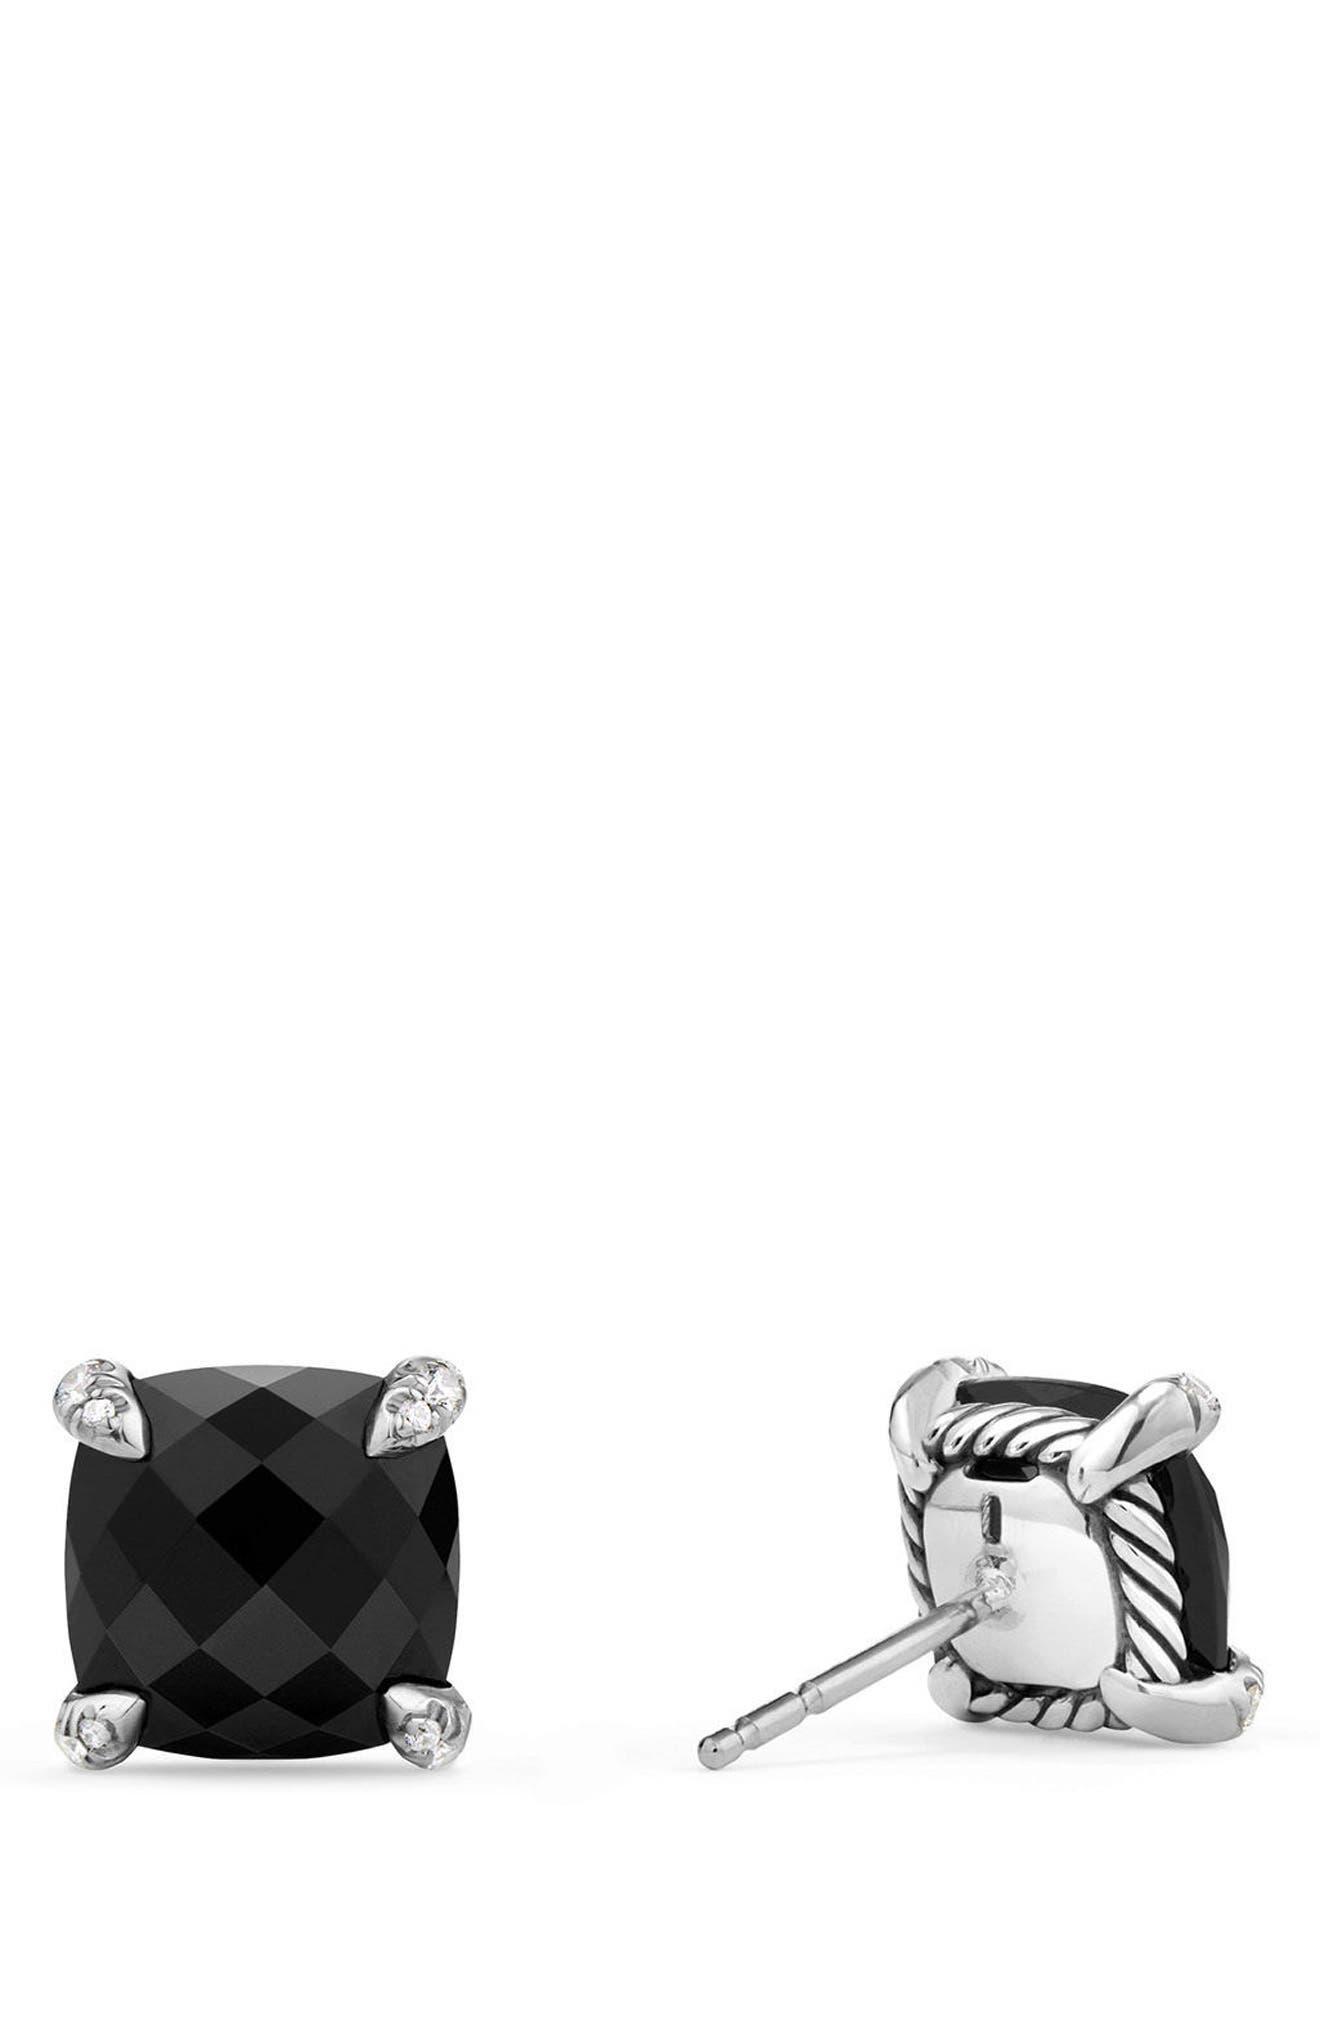 Châtelaine Earrings with Diamonds,                             Main thumbnail 1, color,                             BLACK ONYX?